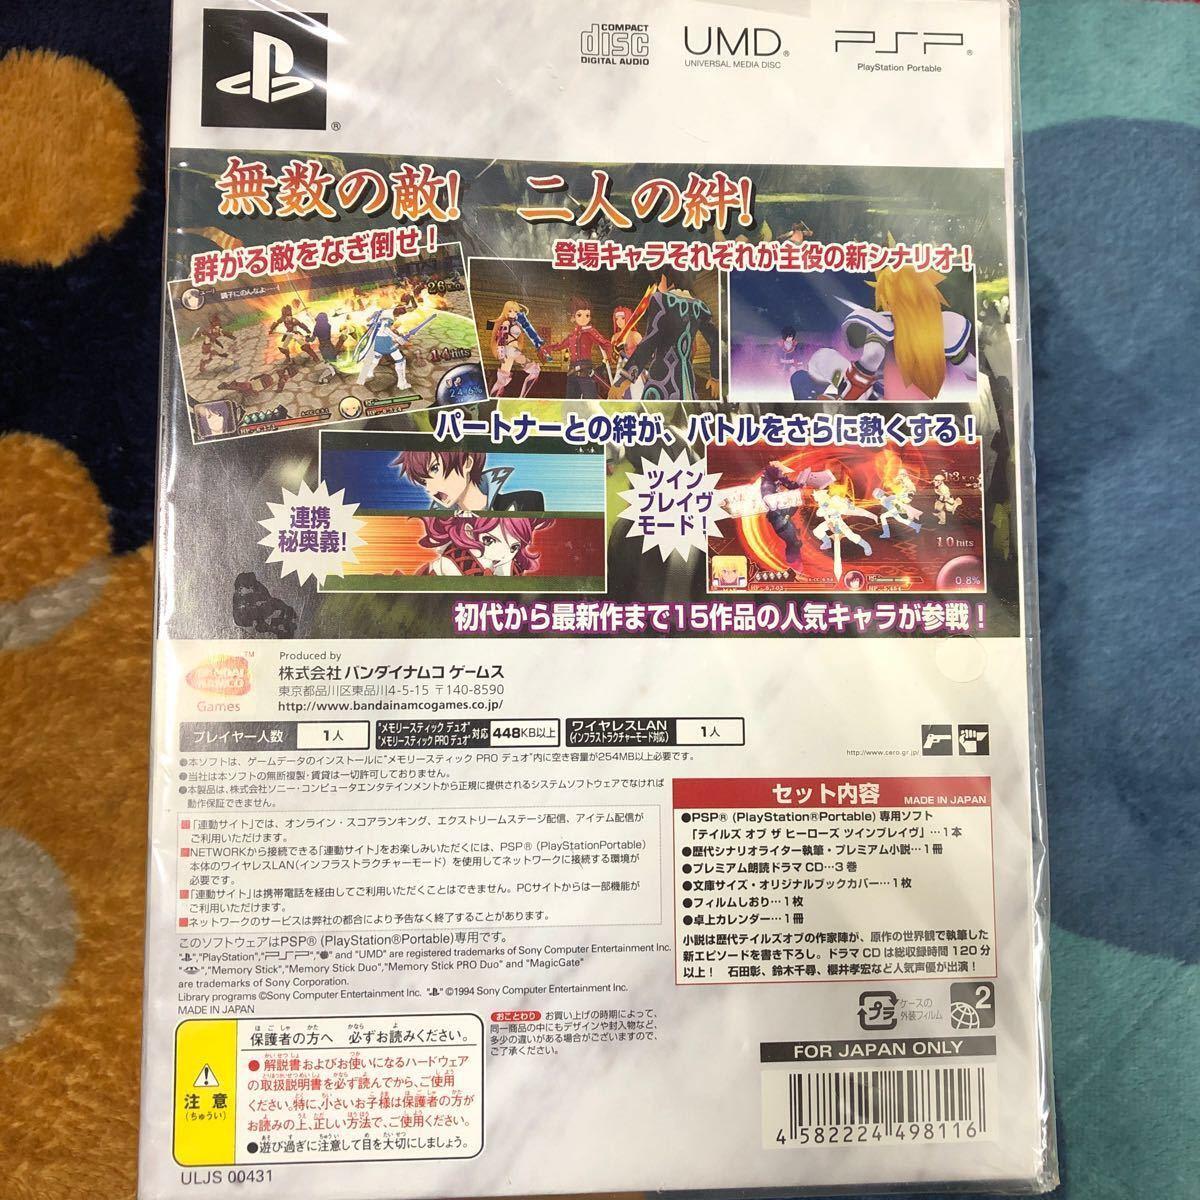 【PSP】 テイルズ オブ ザ ヒーローズ ツインブレイヴ [初回生産限定プレミアムBOX]未開封品